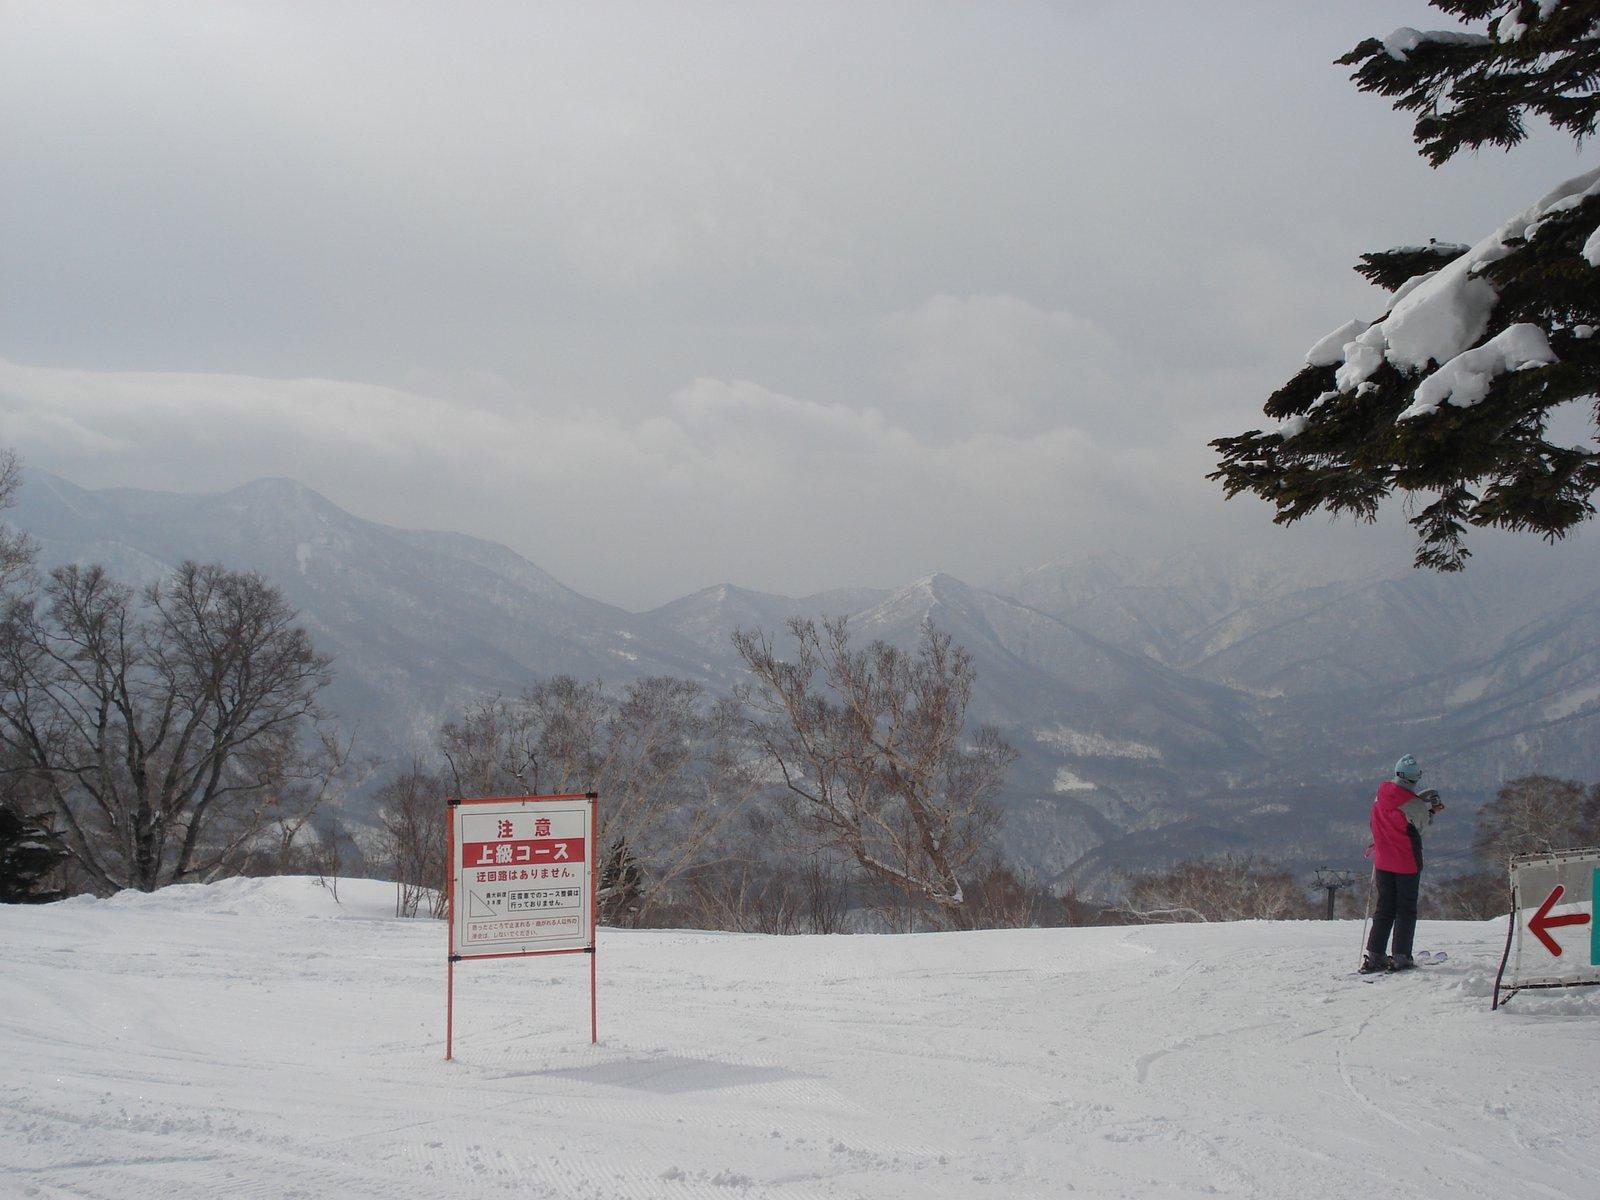 Jappy ski